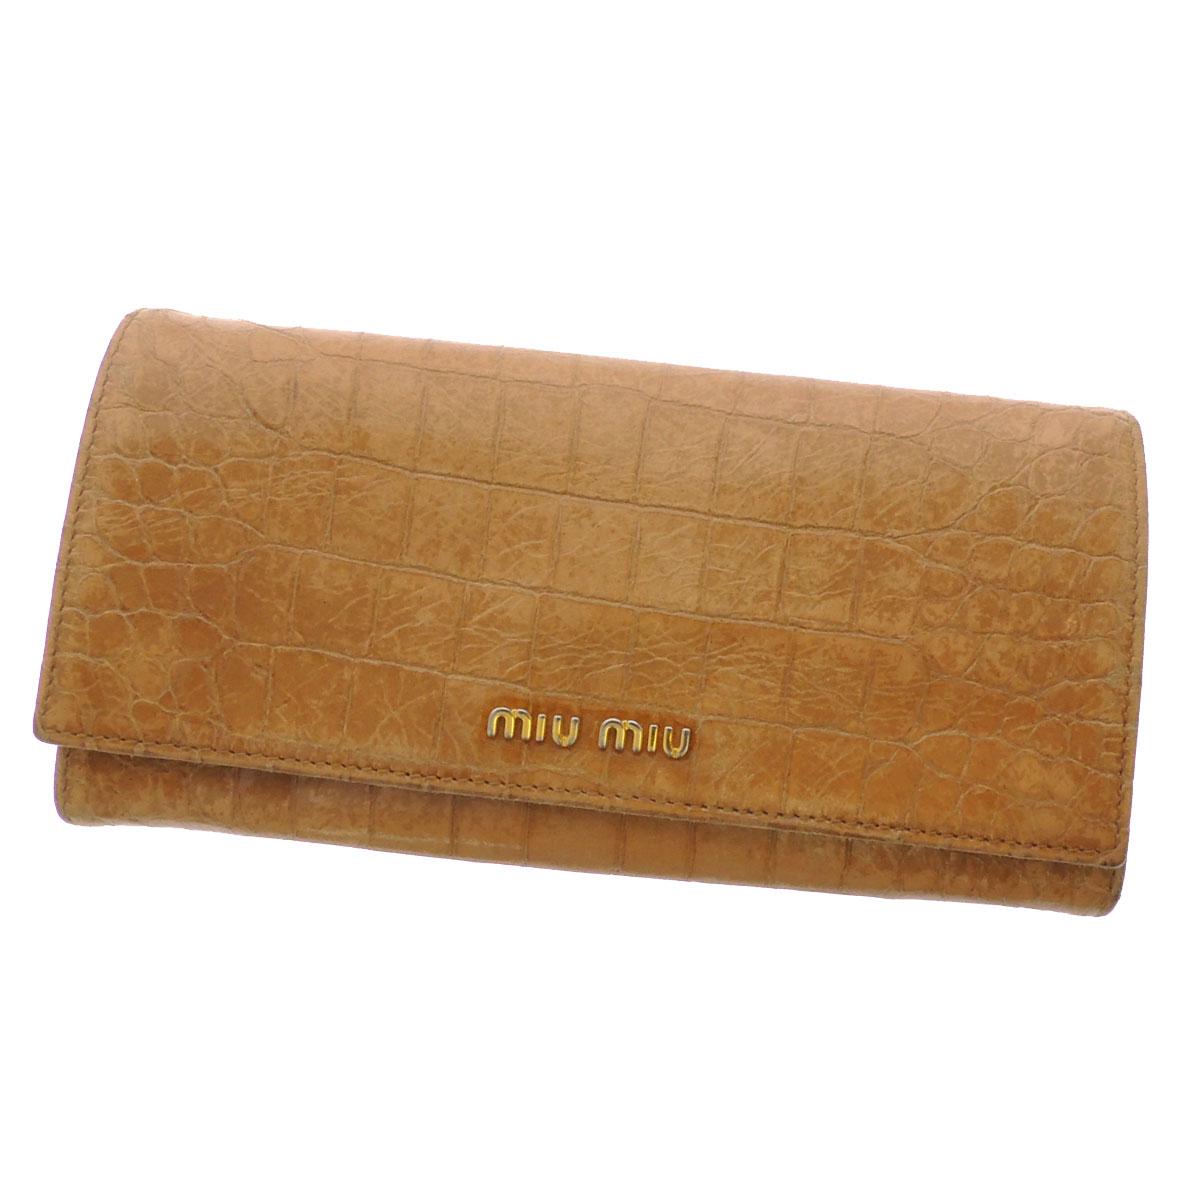 MIUMIU Croc-down wallets (purses and) enamel x Leather Womens upup7